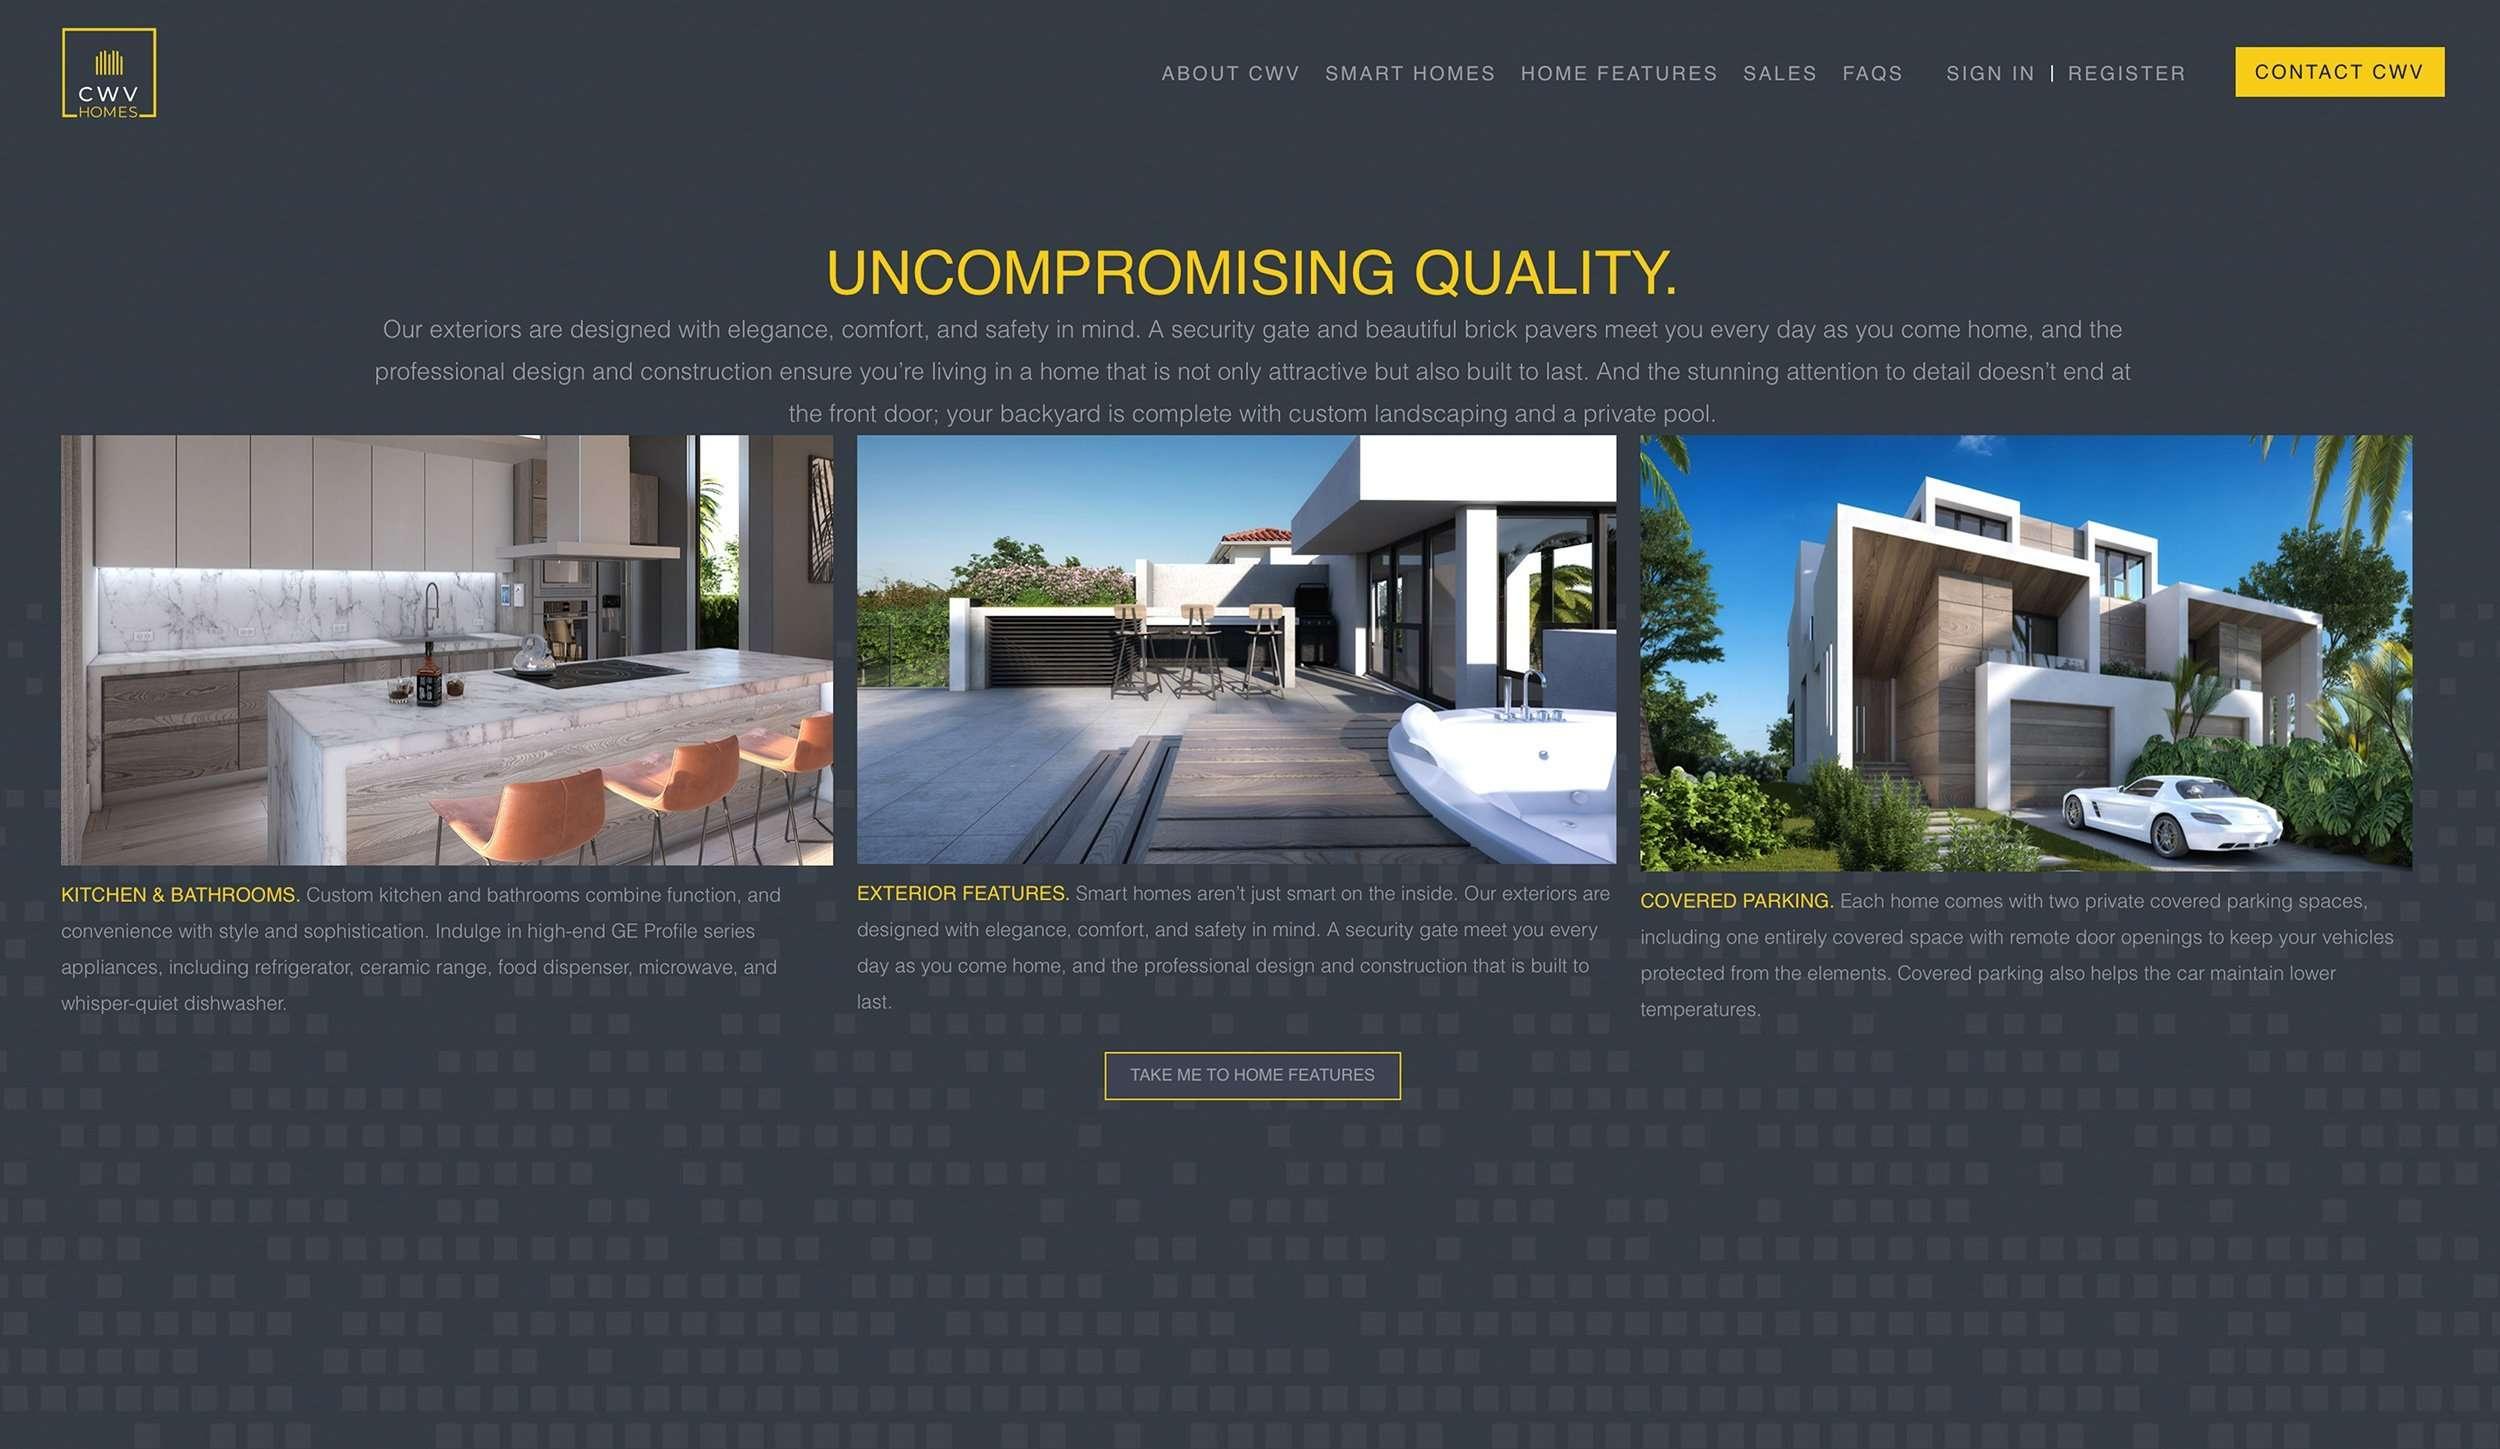 cwv-group-miami-usa-estados-unidos-real-estate-online-lab-lisbon-web-development-web-design-16